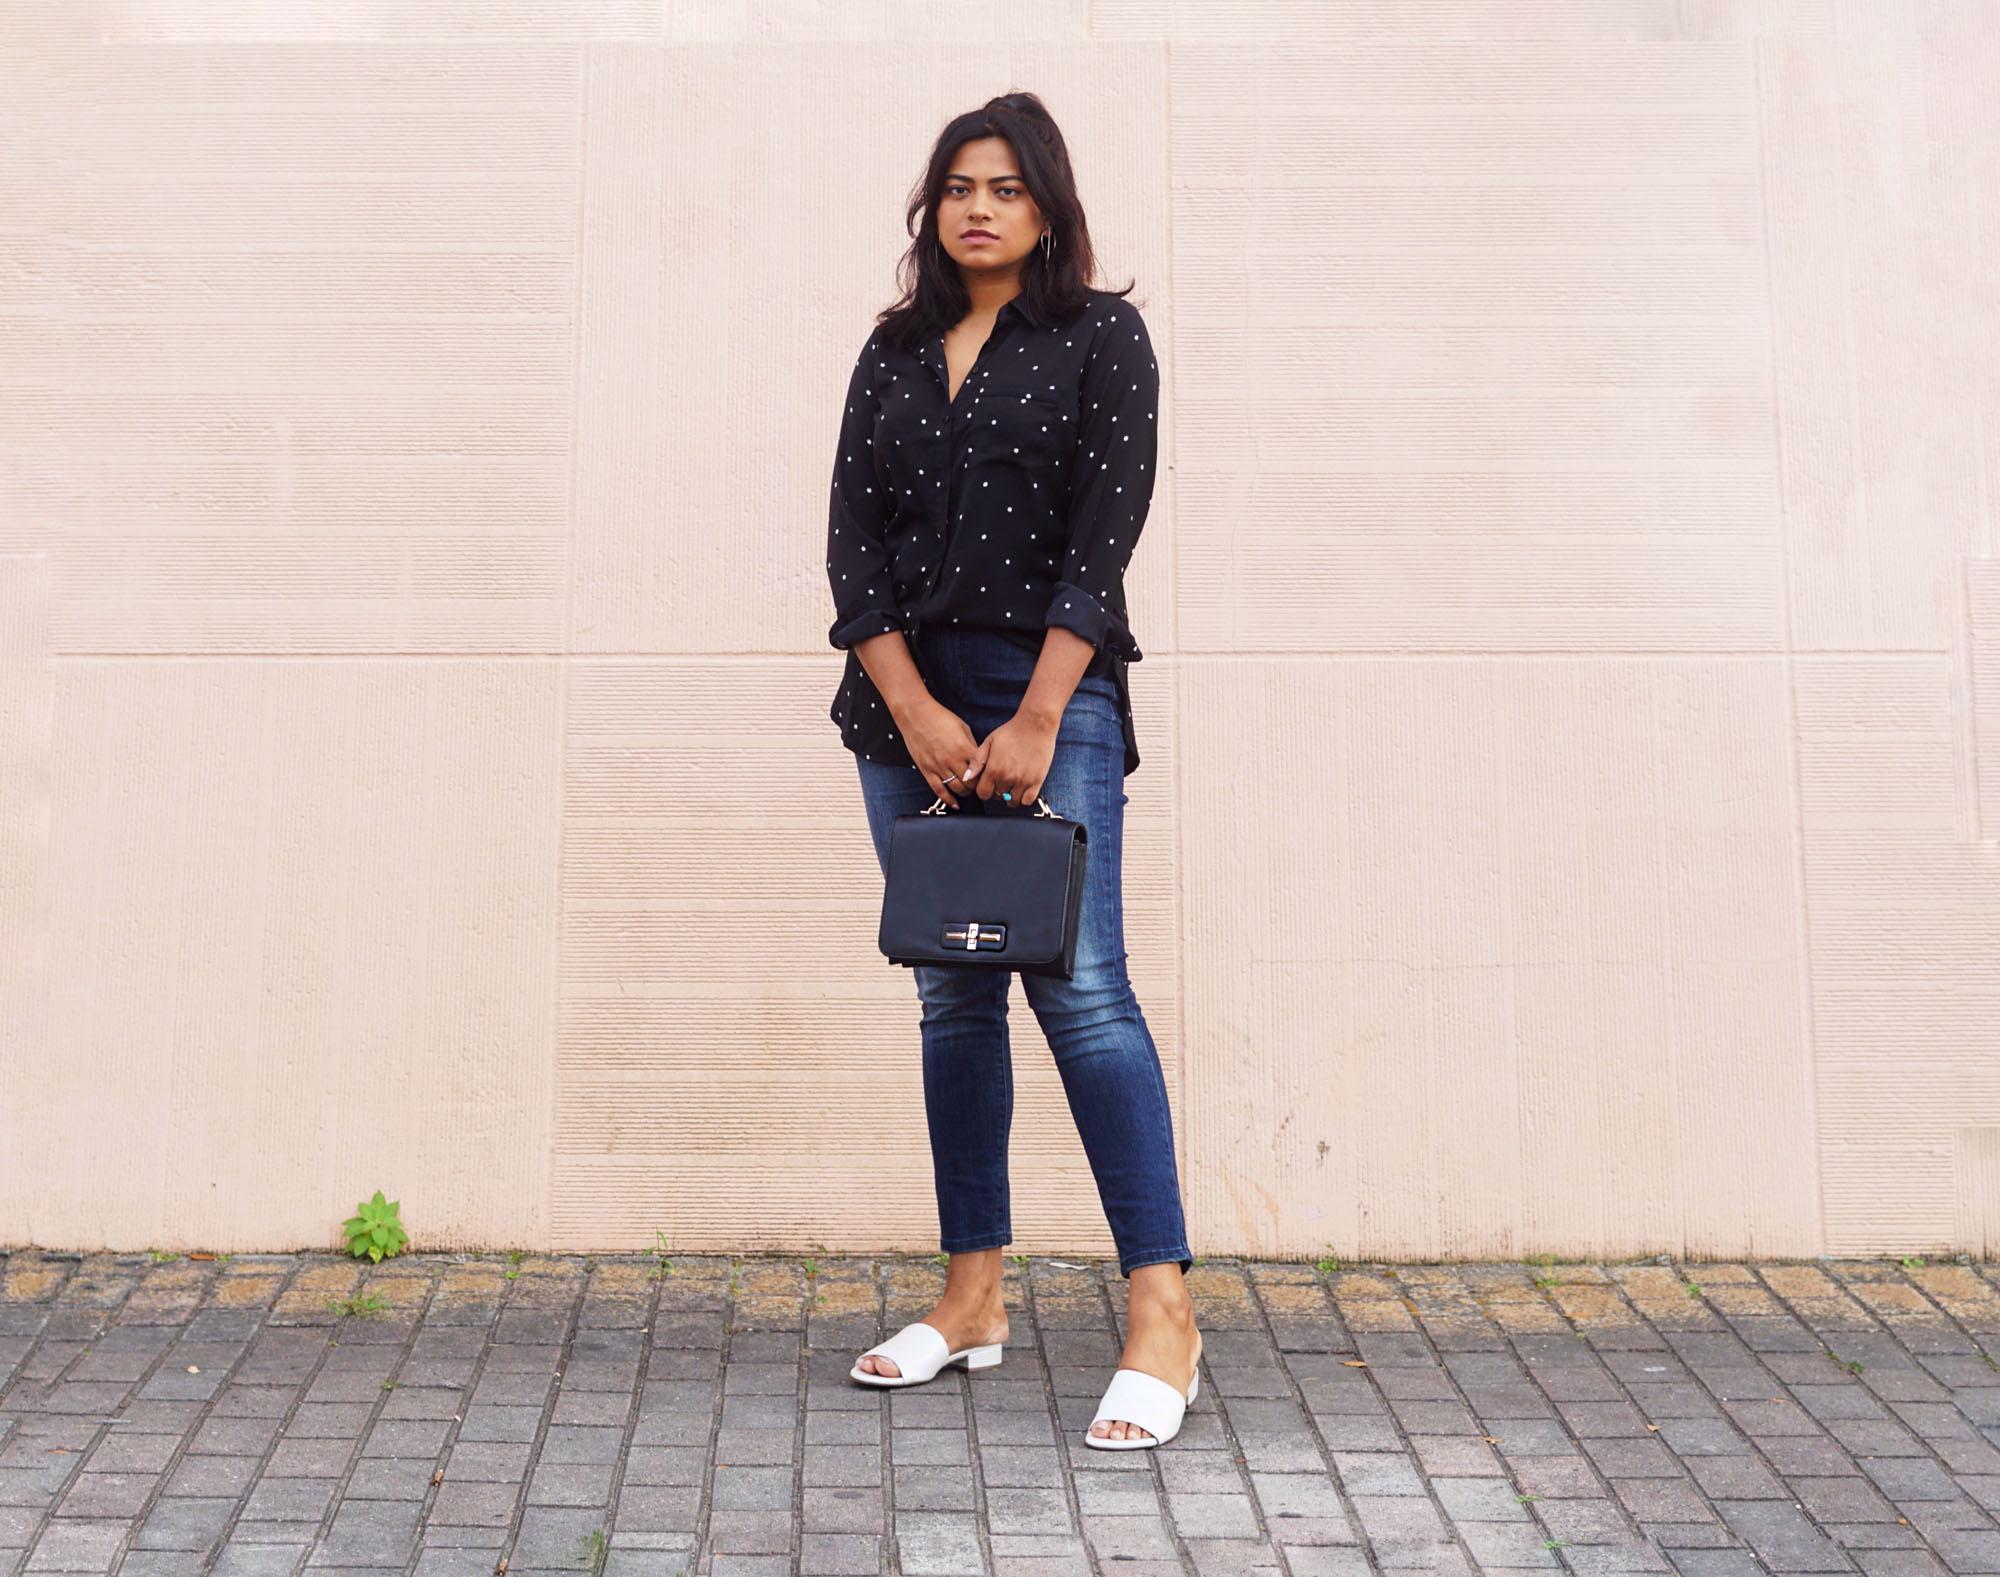 Miami Street Style Blogger Chic Stylista